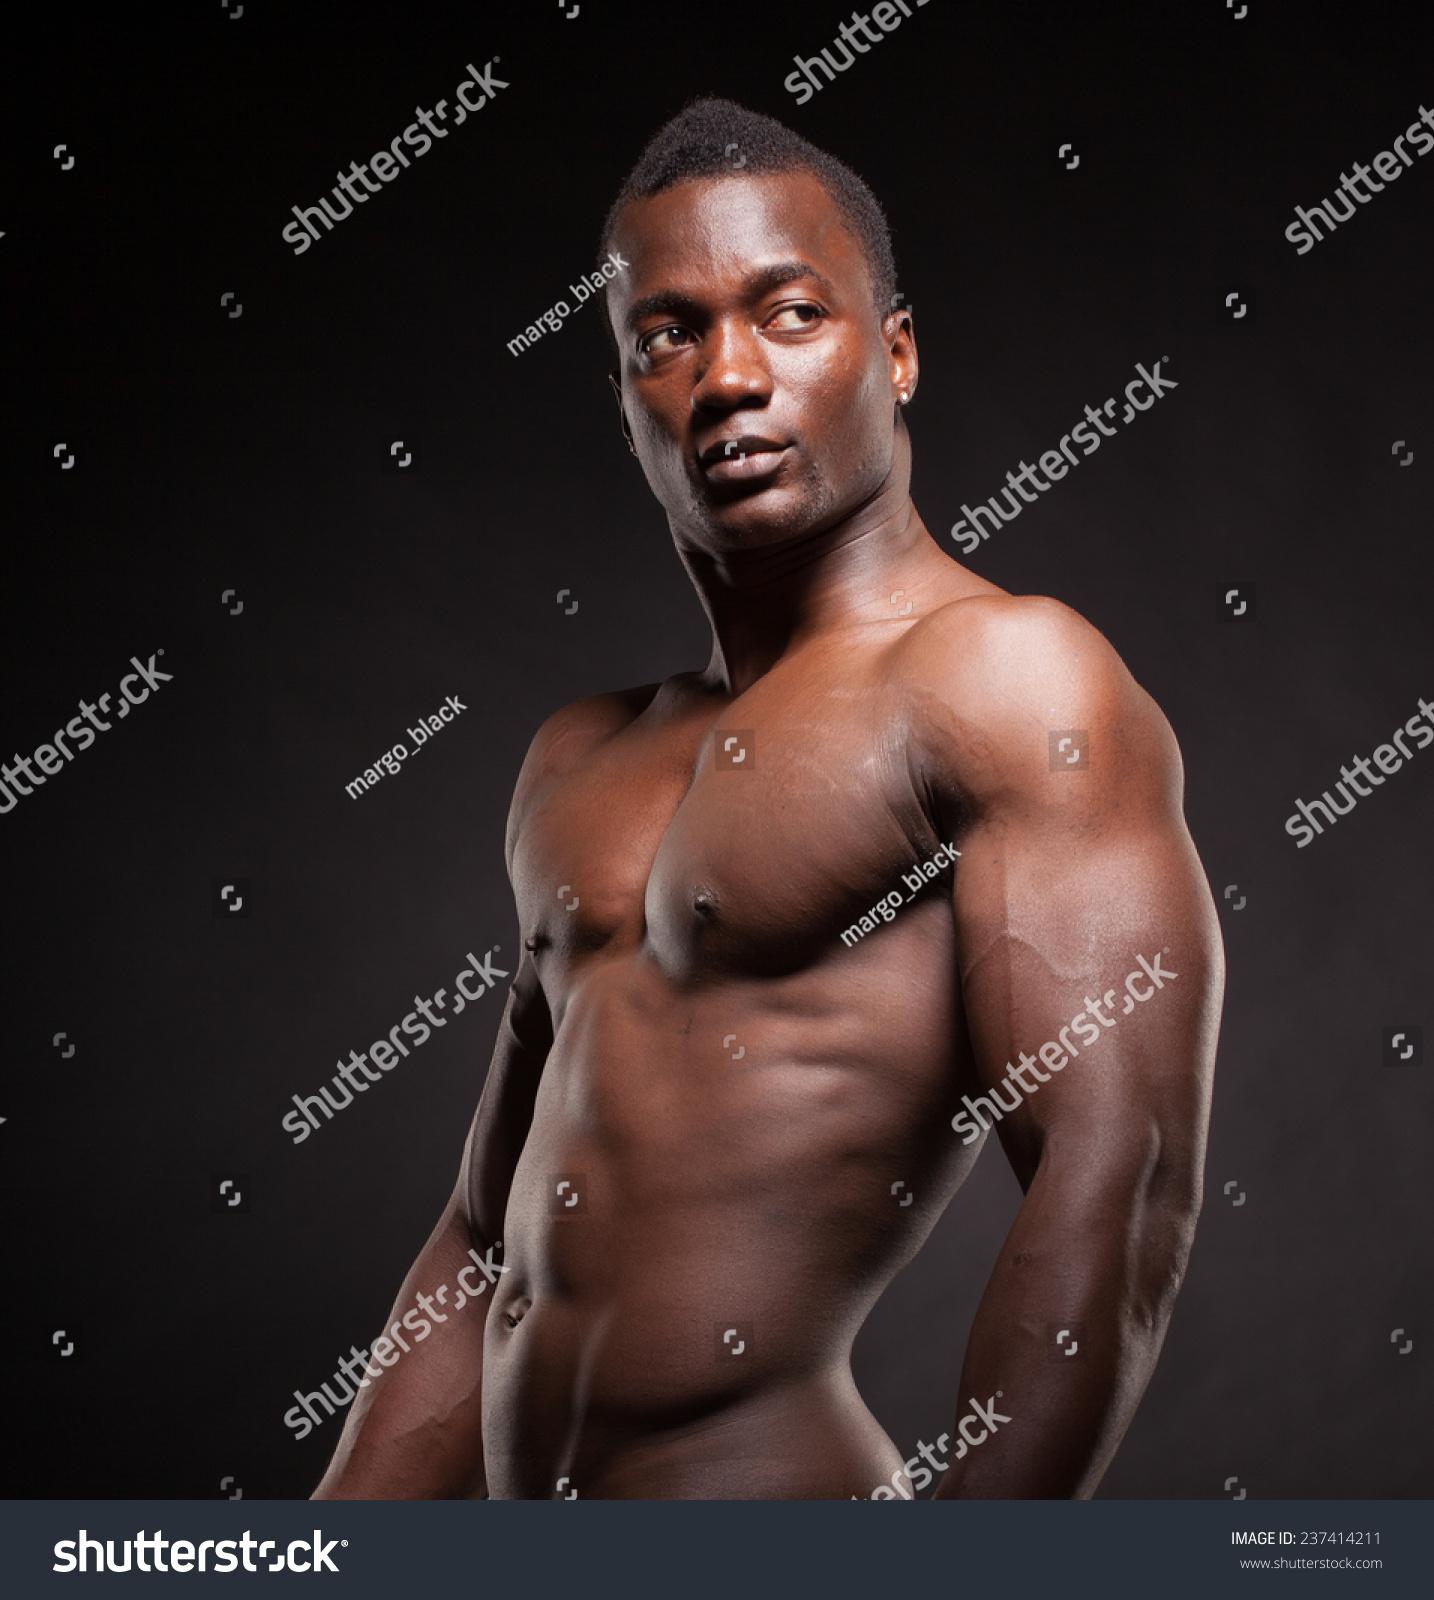 Beautiful muscular black man dark background stock photo edit now jpg  1434x1600 Dark black muscle 9b45b3820